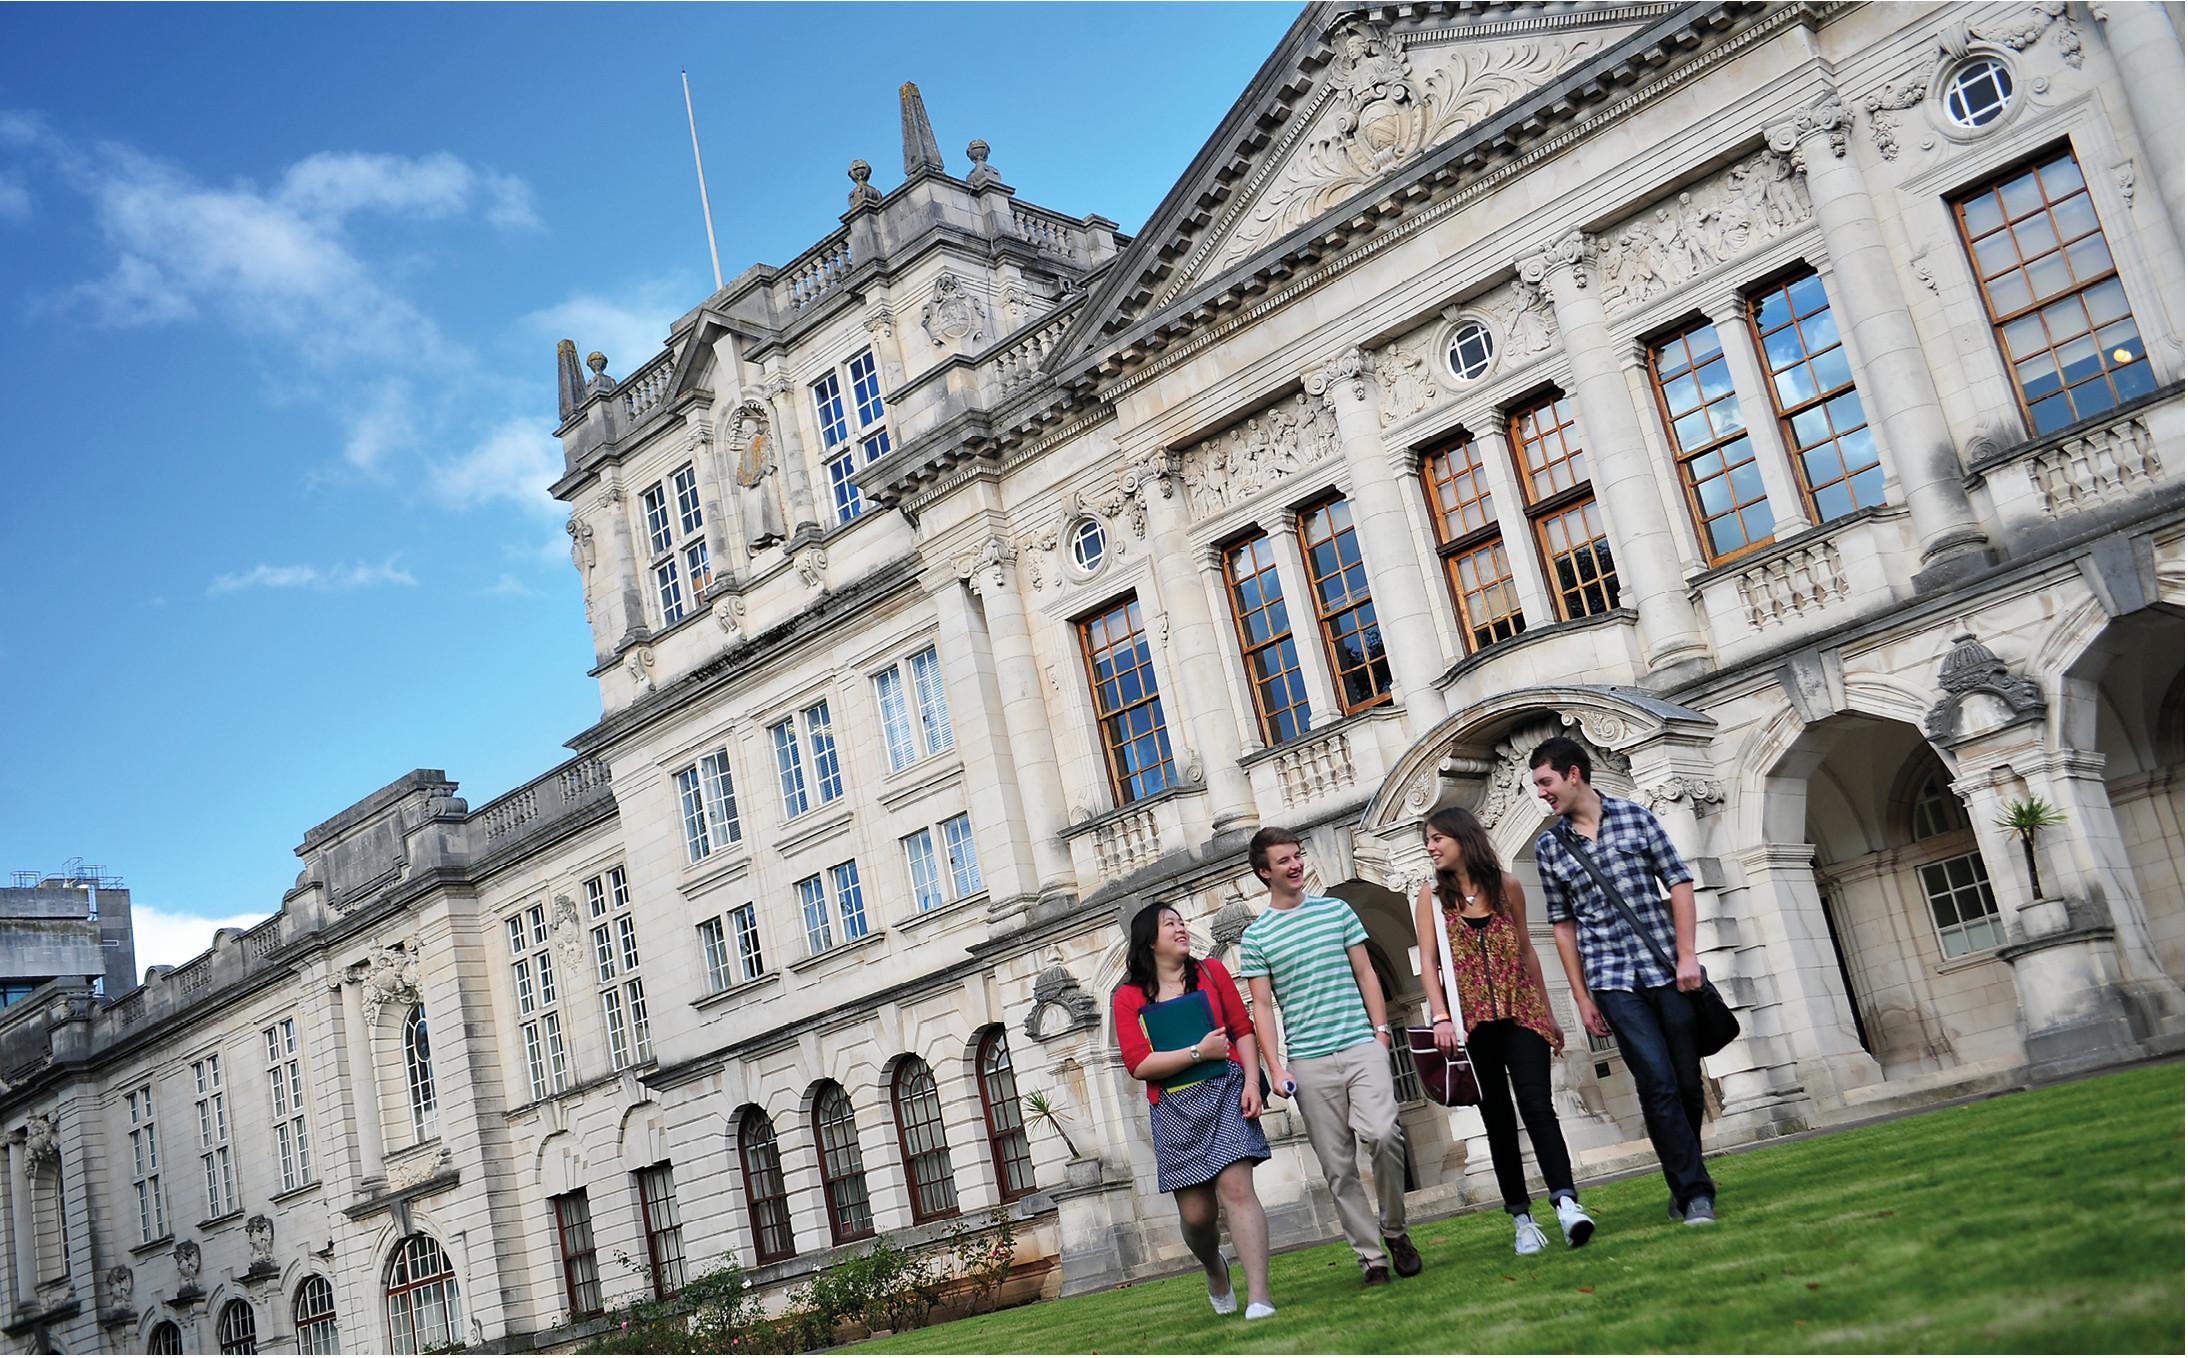 Undergraduates at Cardiff University